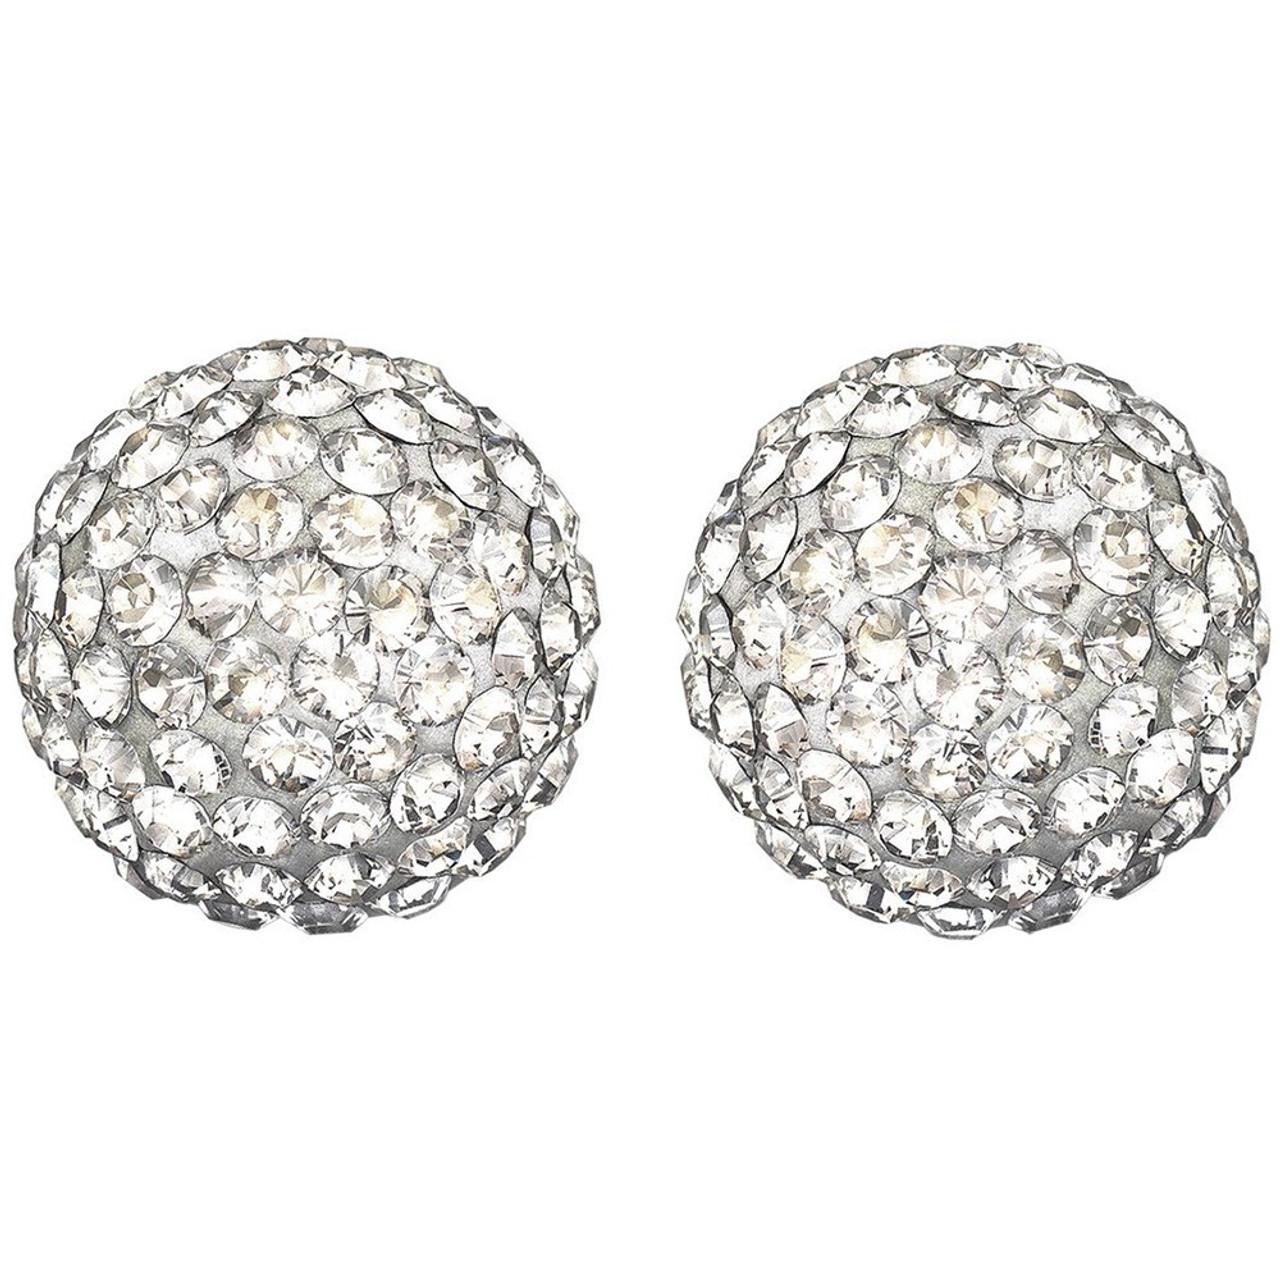 225902c48 swarovski-emma-pierced-stud-earrings-rhodium -1730583__87240.1532295411.jpg?c=2&imbypass=on